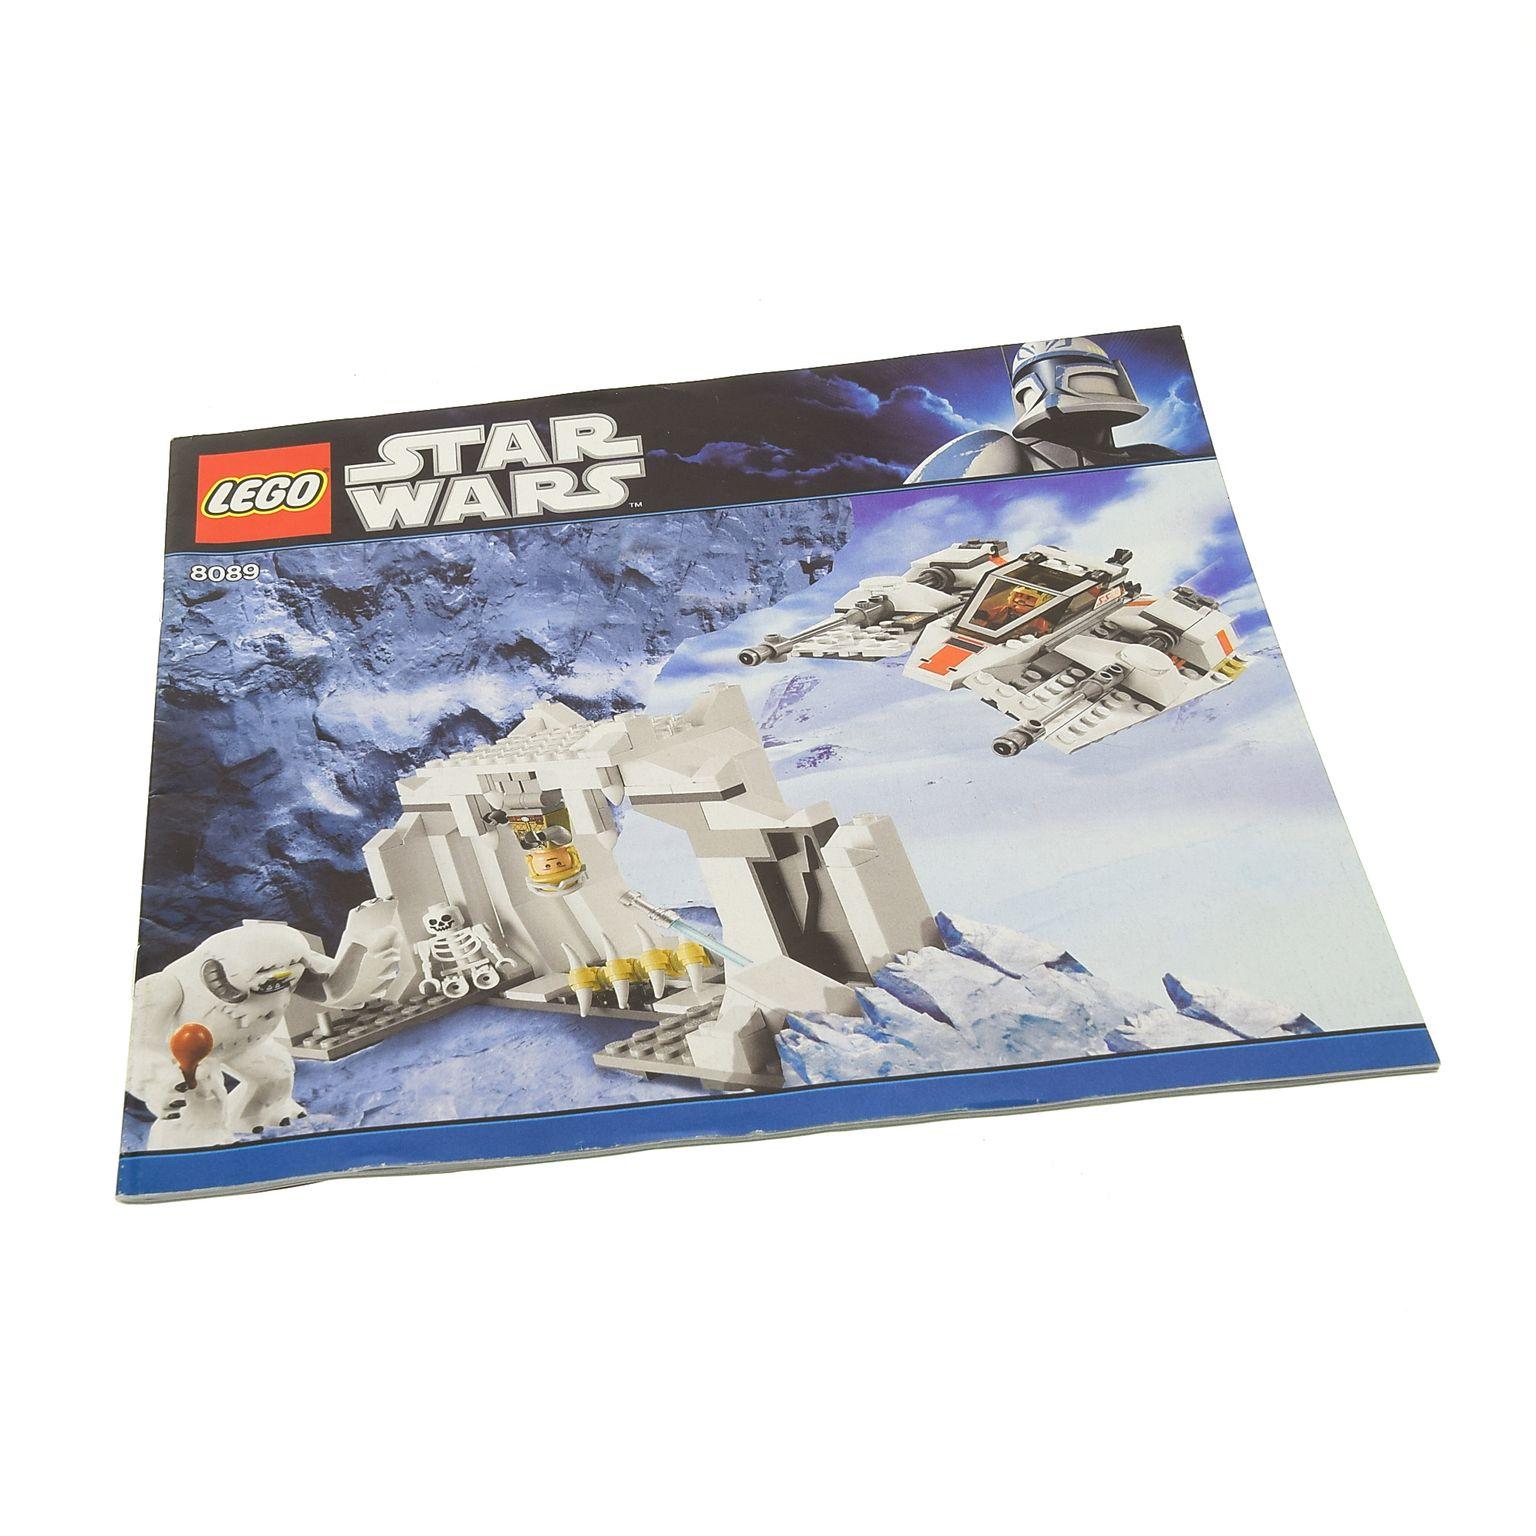 1 X Lego Brick Instructions Star Wars Episode 456 Hoth Wampa Cave